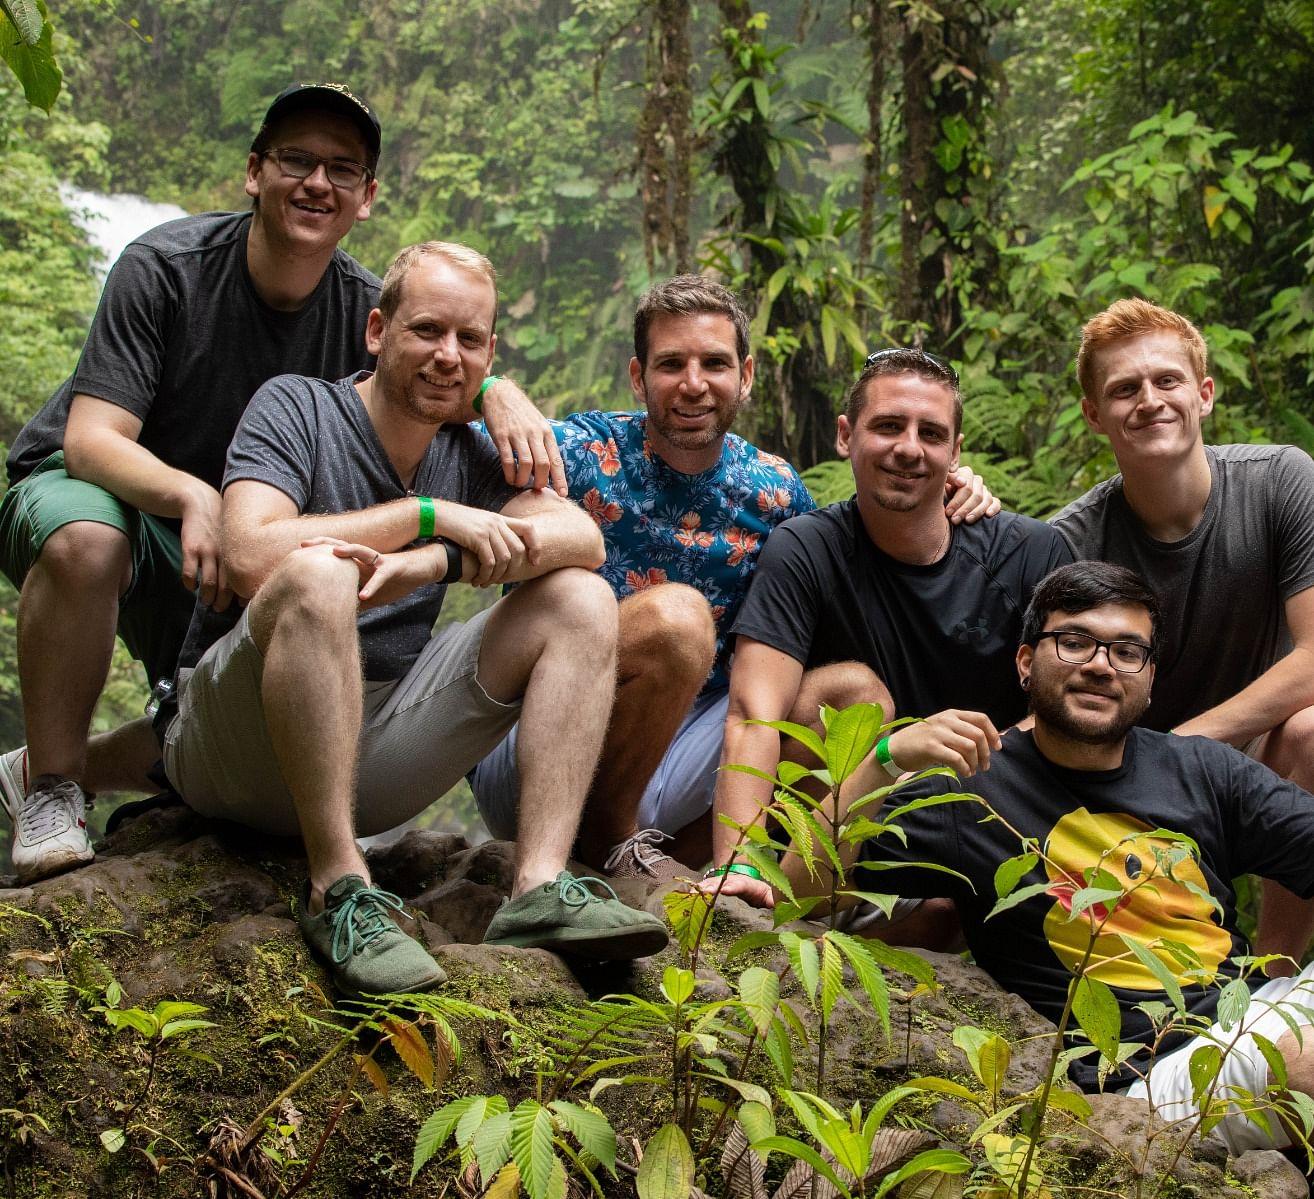 Members of the Vanishing Inc. Magic team pose near a waterfall in Costa Rica